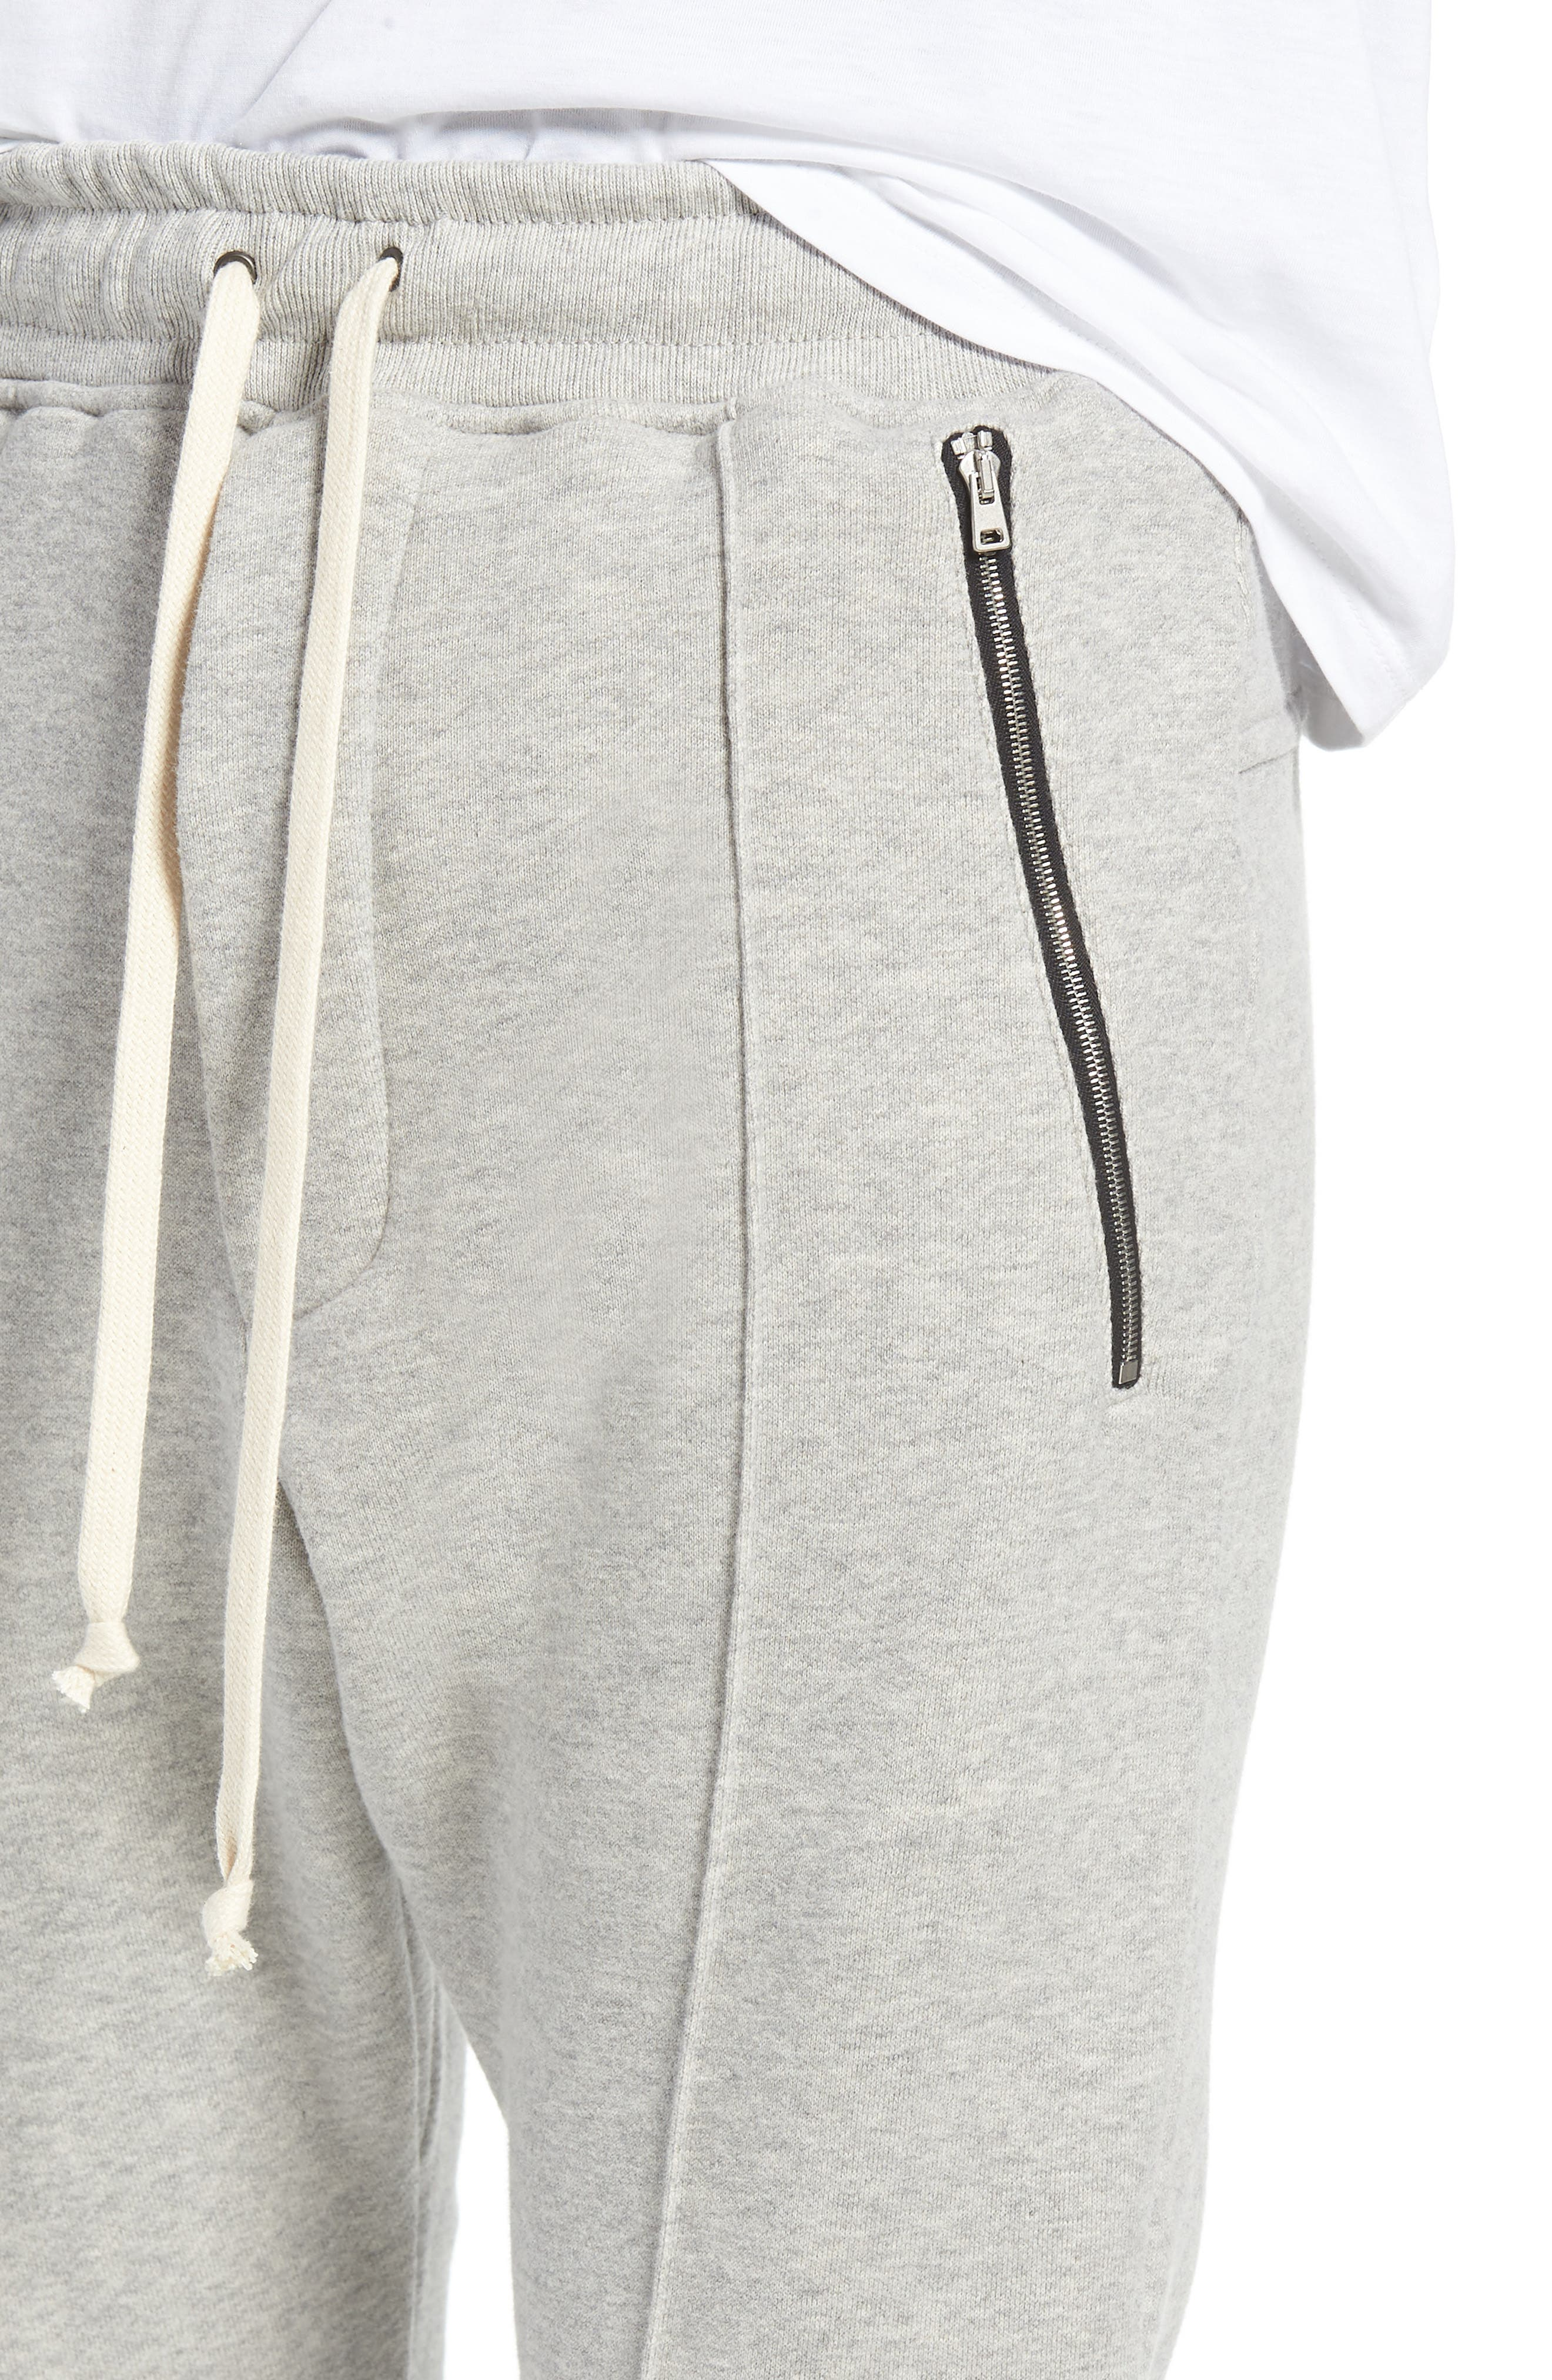 Plaid Jogger Pants,                             Alternate thumbnail 4, color,                             Grey